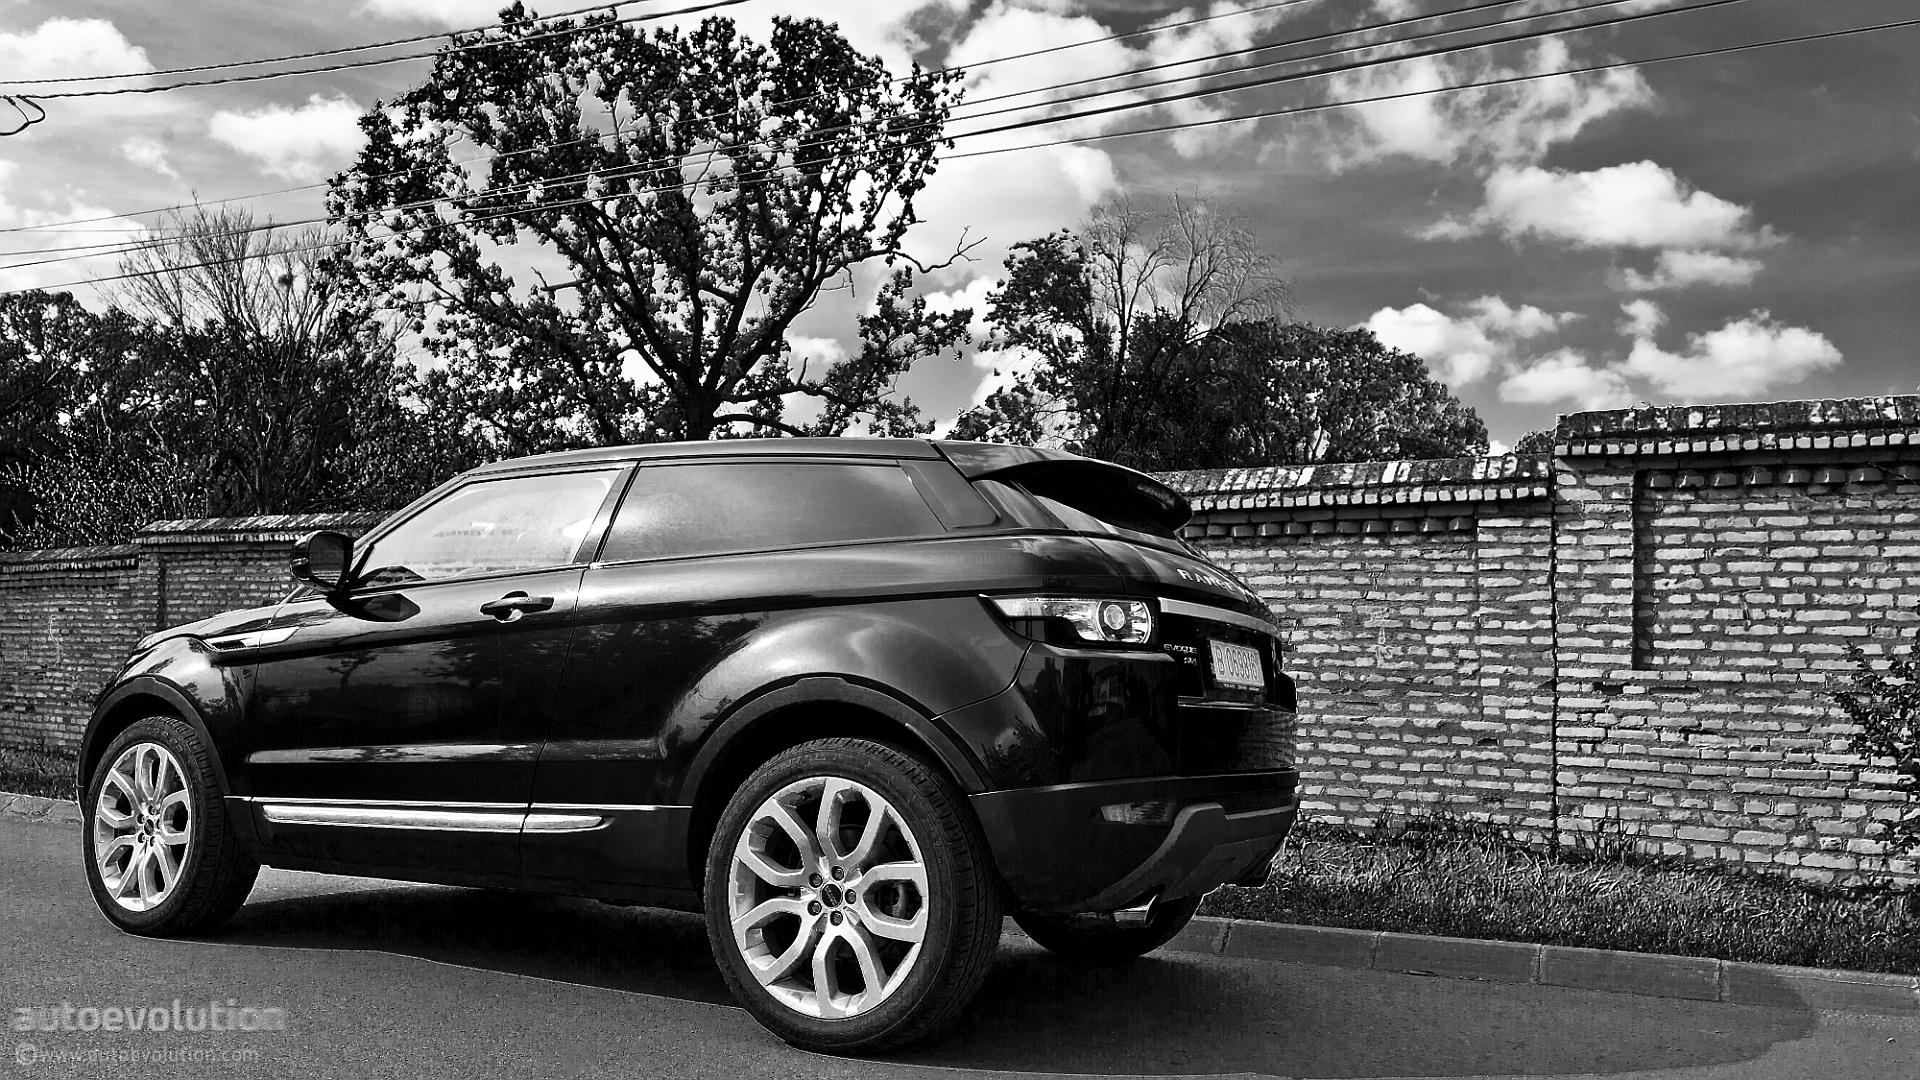 range rover evoque coupe review page 2 autoevolution. Black Bedroom Furniture Sets. Home Design Ideas